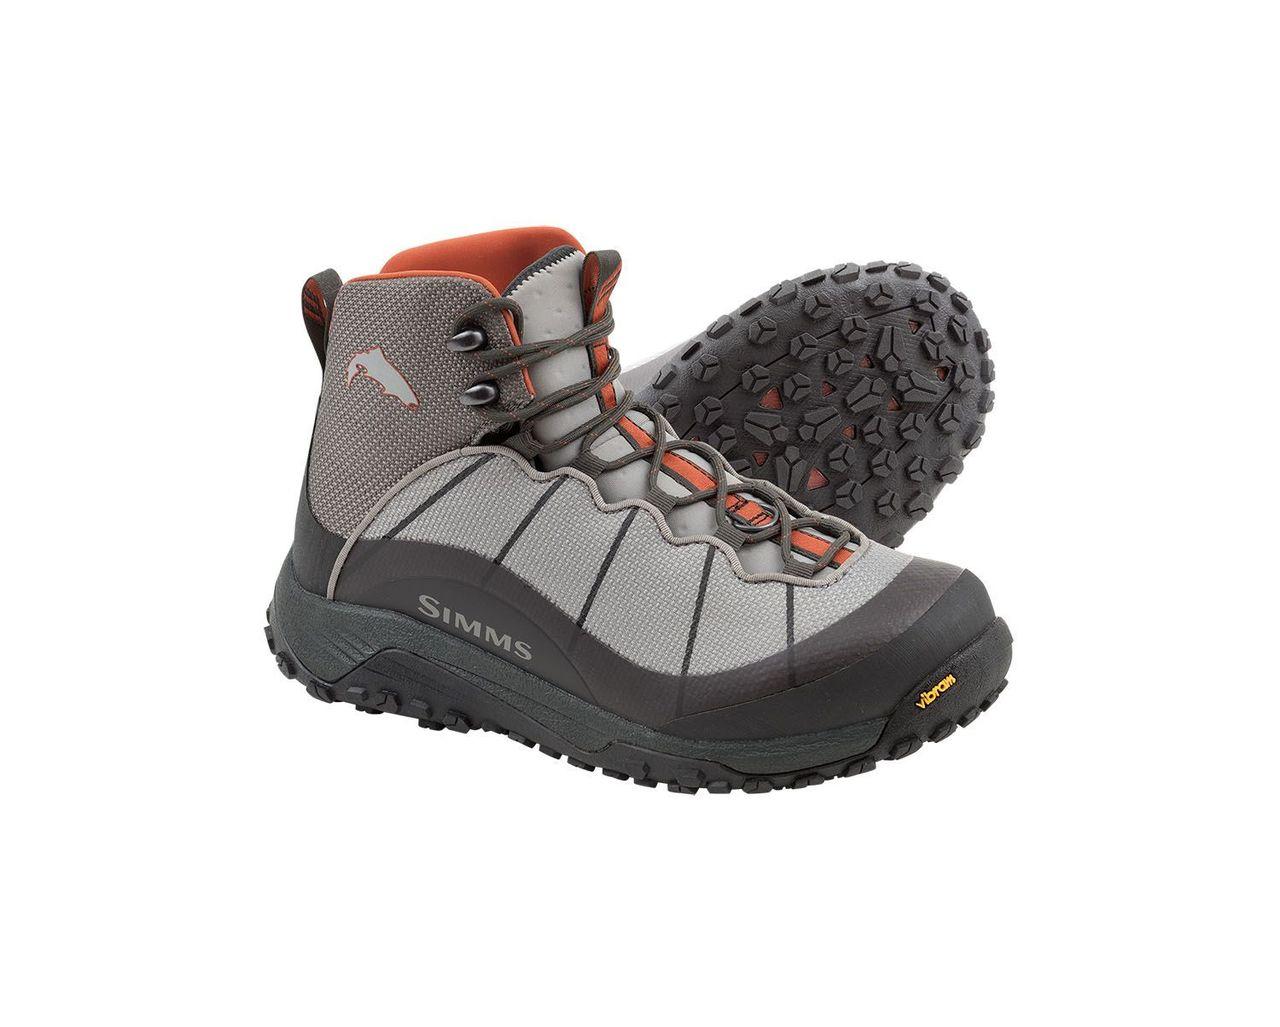 Chaussures Simms Femme - Flyweight Boot - Pointure 37